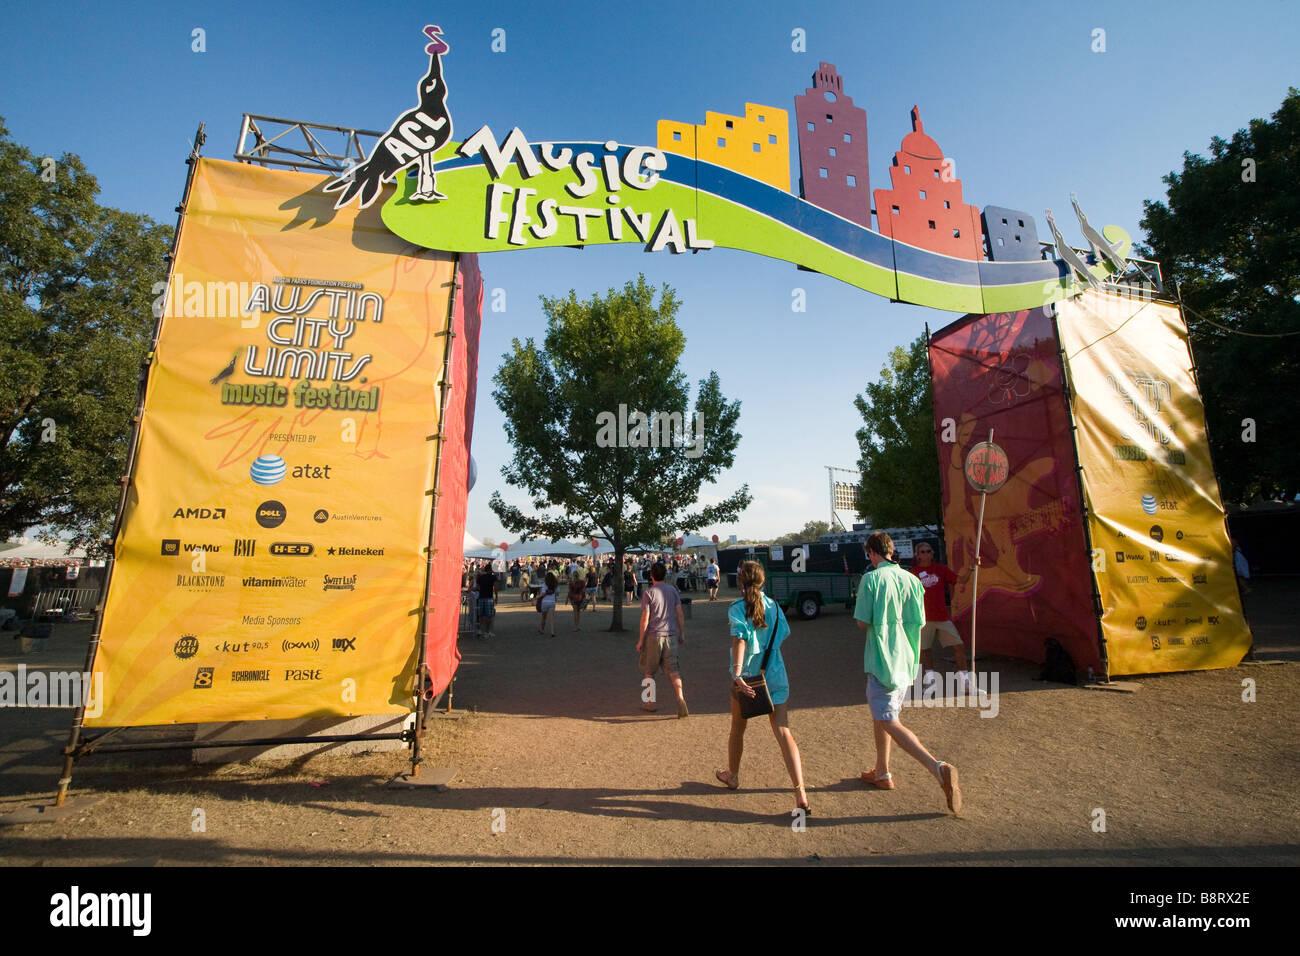 Austin, Texas - Fans  walking through a gate into Zilker Park for the Austin City Limits Music Festival 2008 - Stock Image